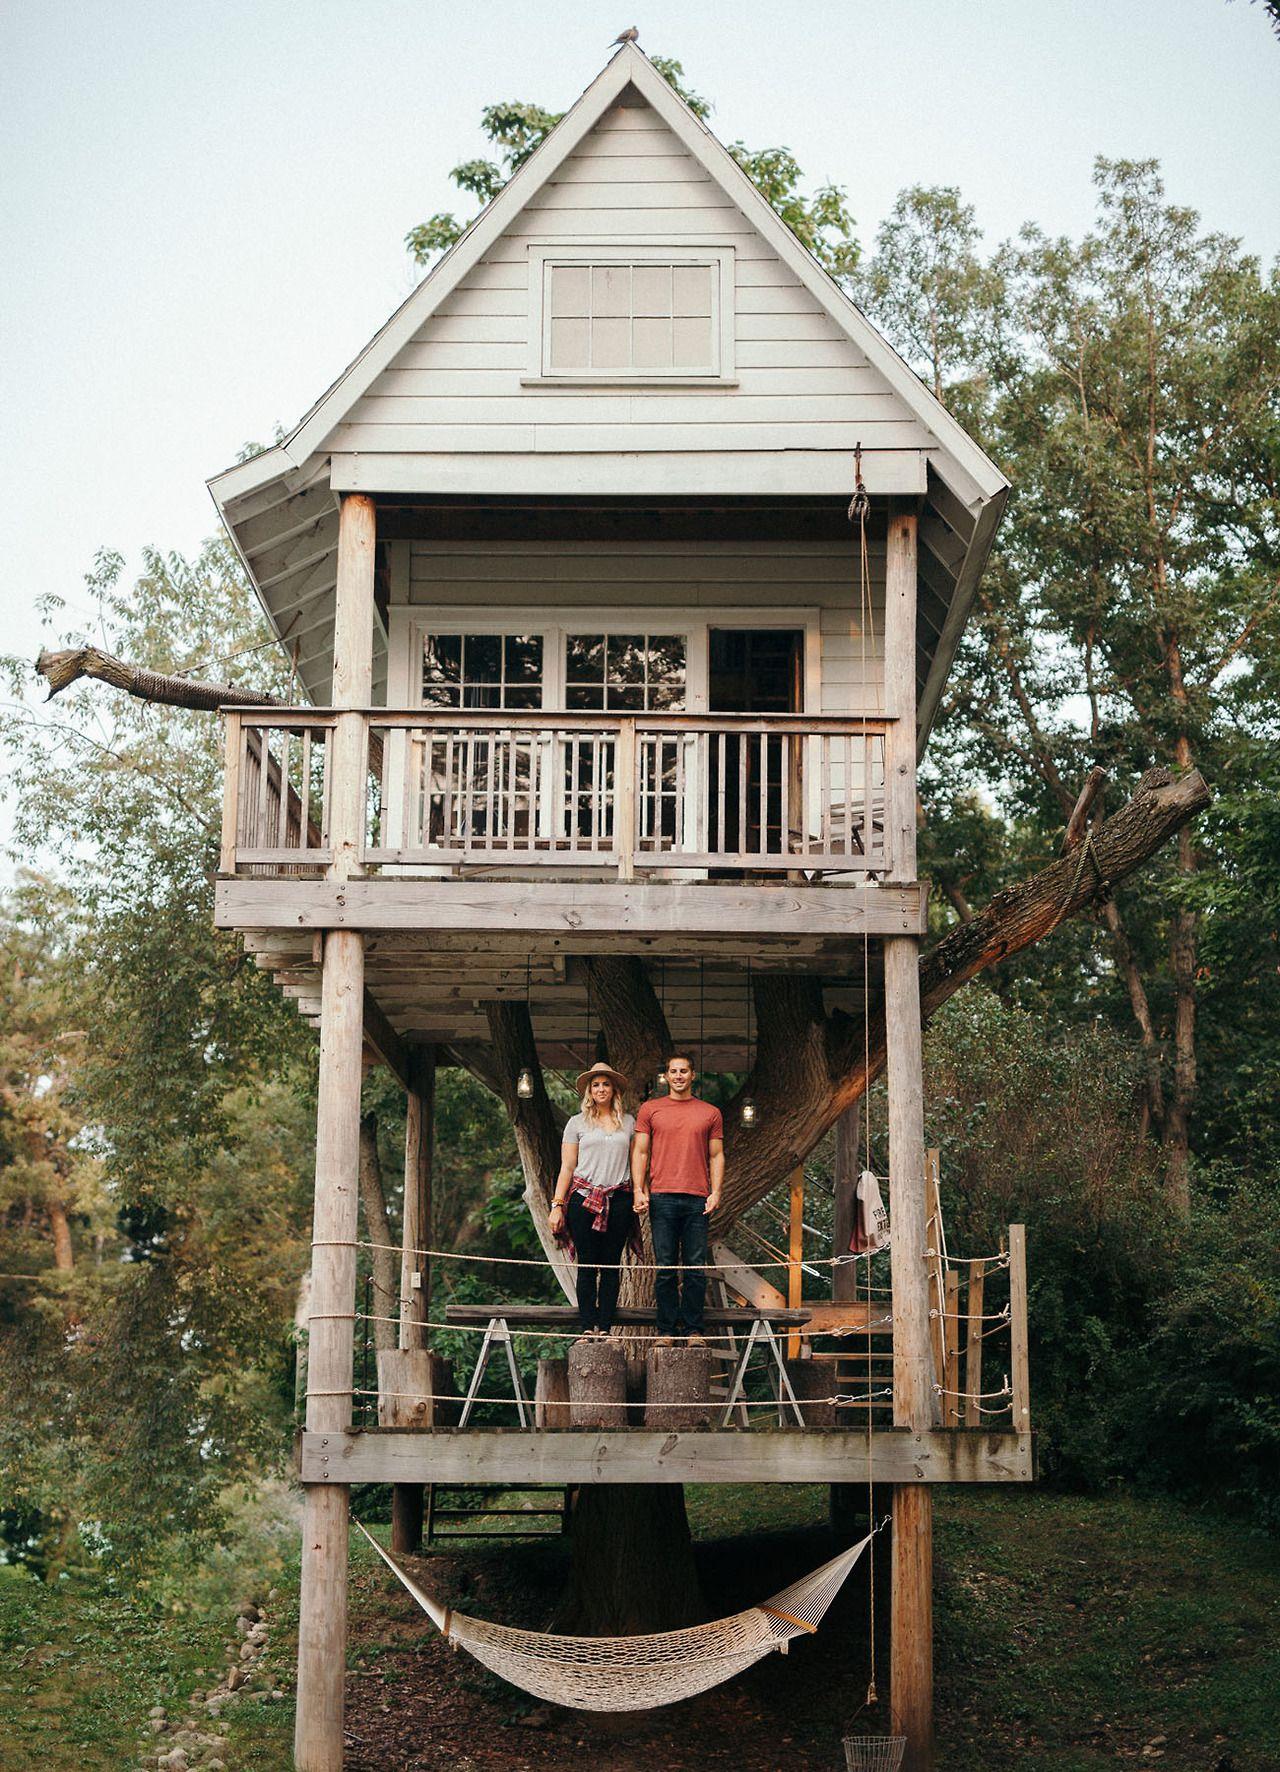 Amazing Treehouse Design In World